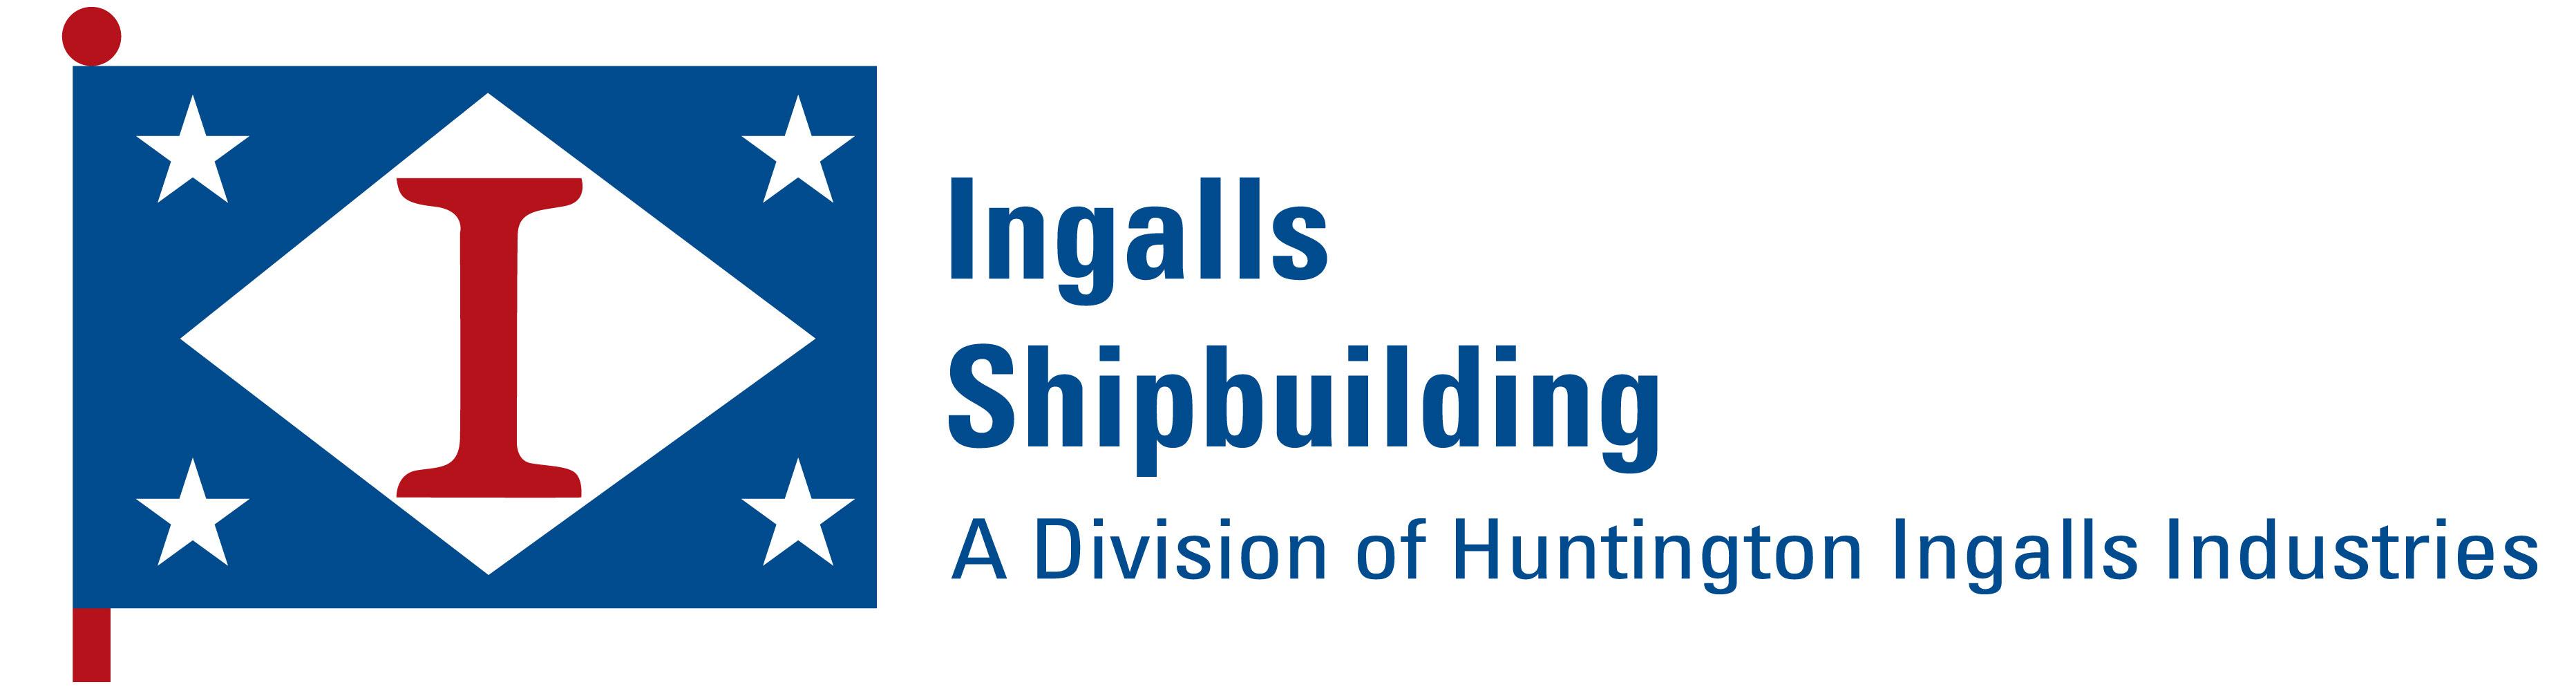 shipbuilding employment partner trade school shipbuilding